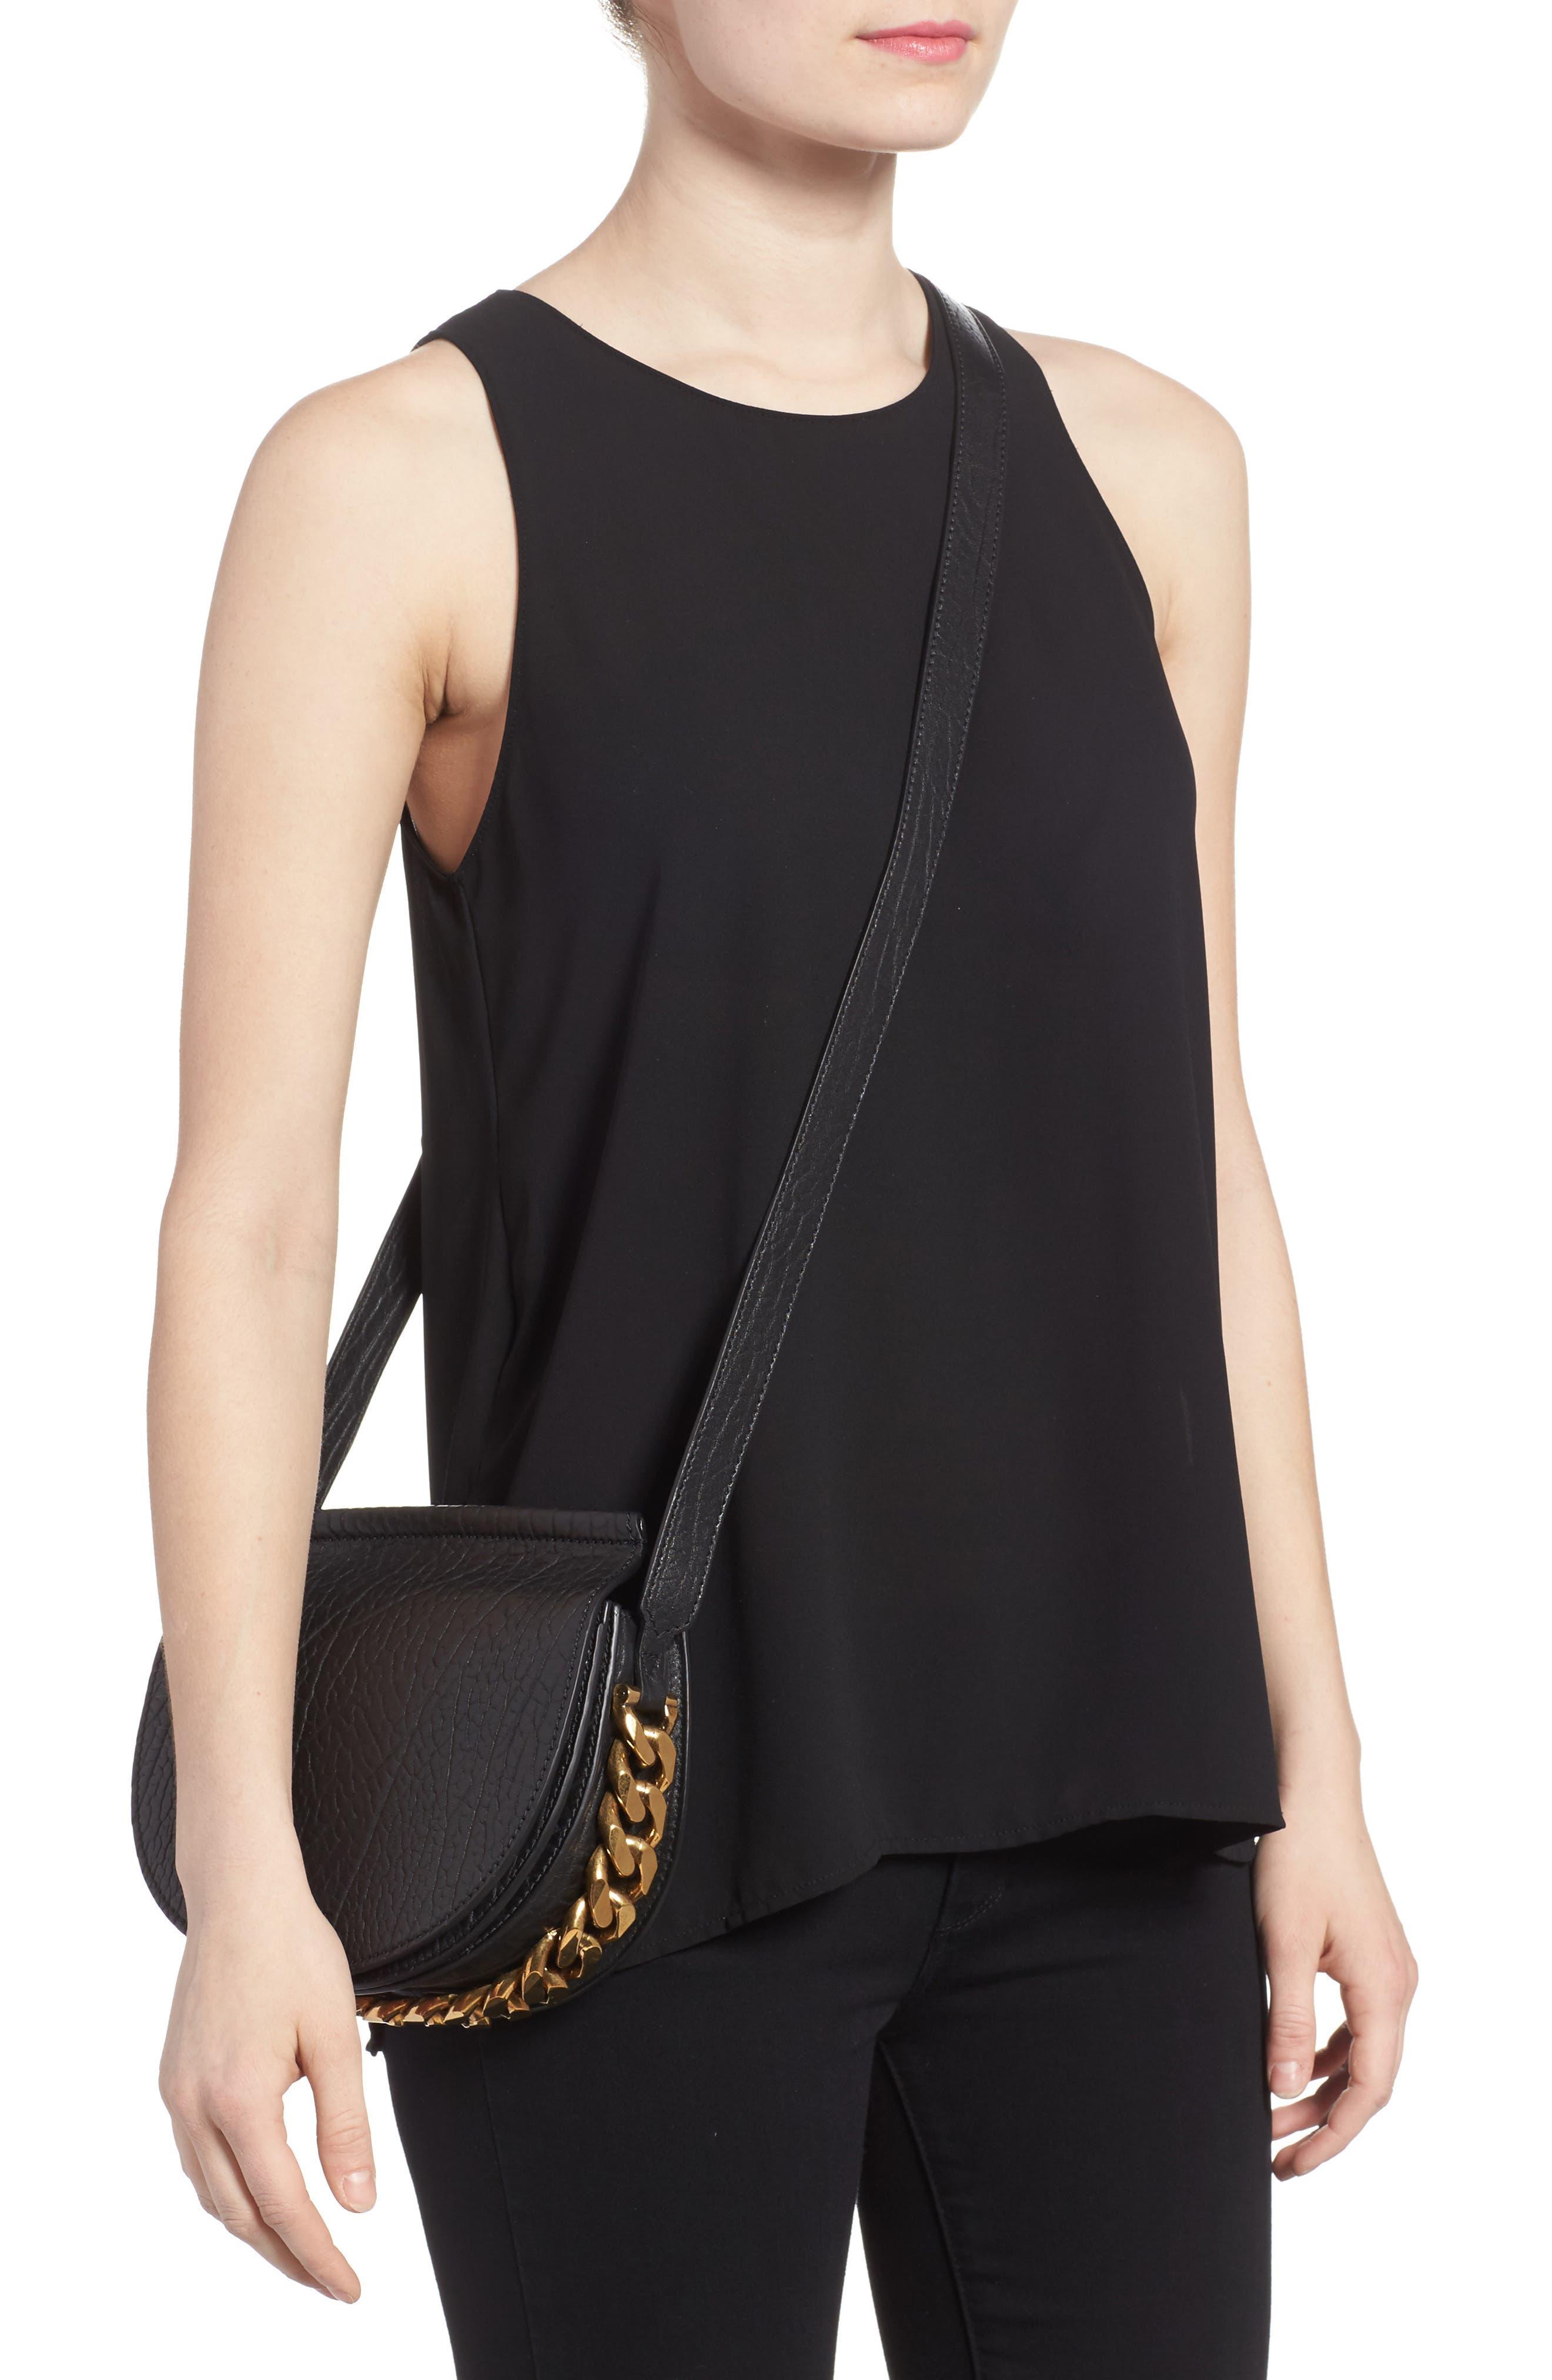 Infinity Calfskin Leather Saddle Bag,                             Alternate thumbnail 2, color,                             Black